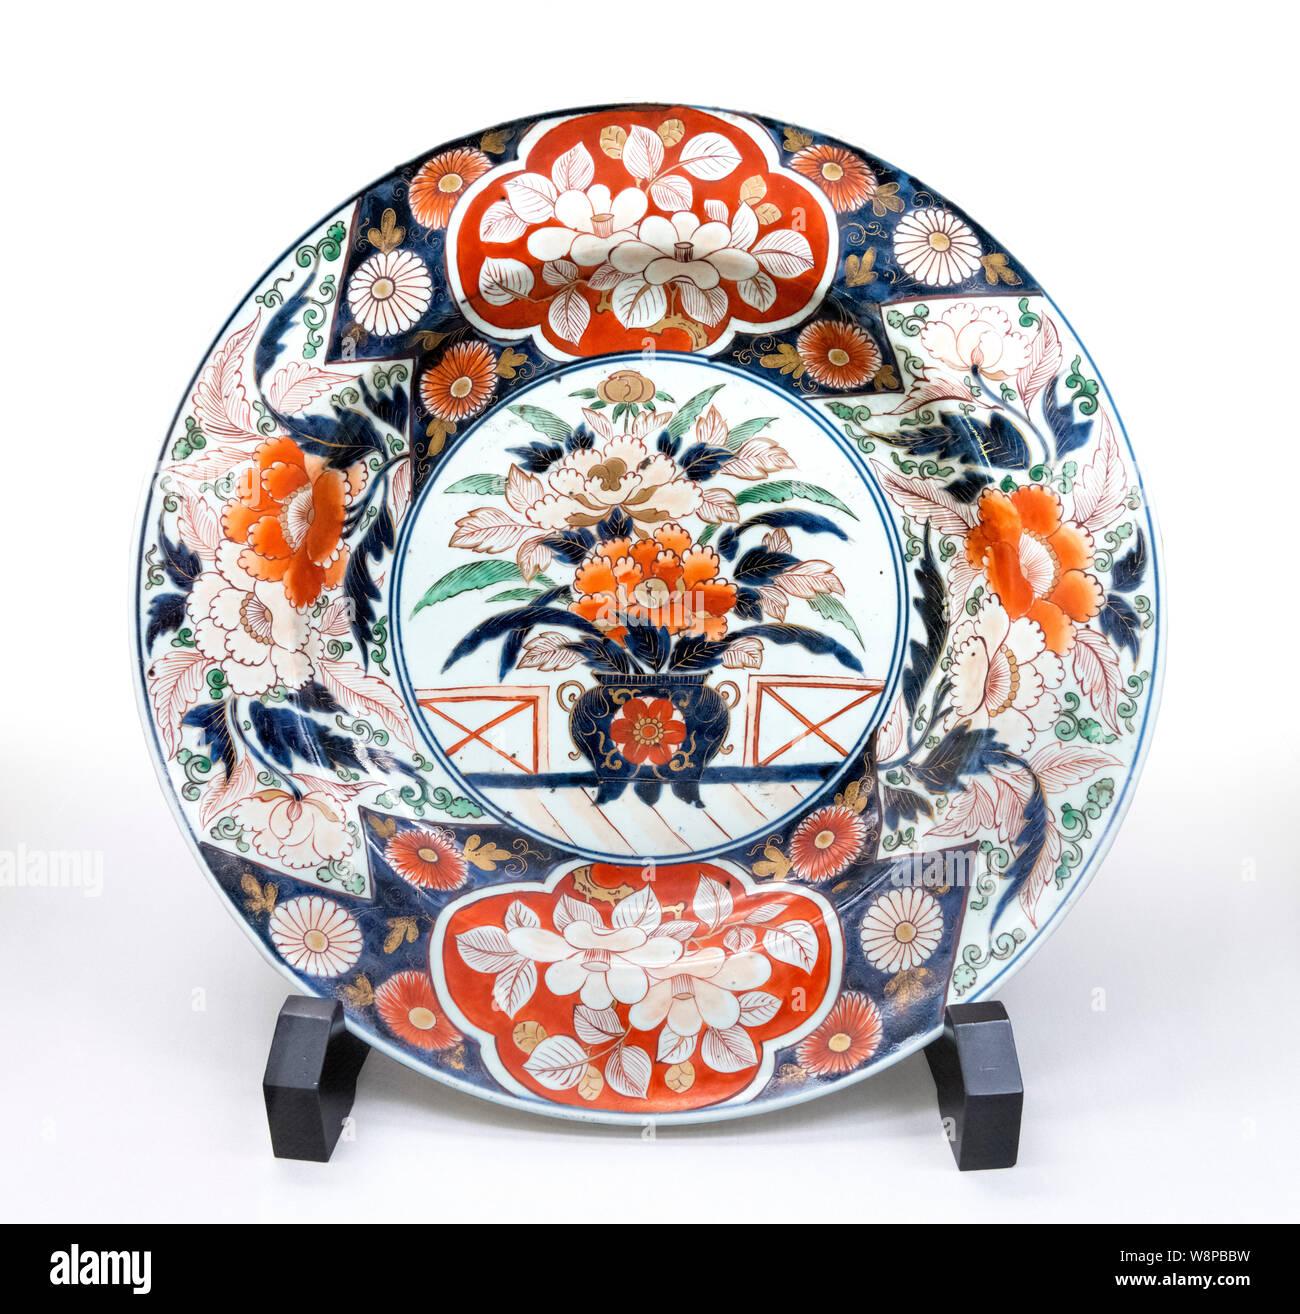 Antique Imari Ironstone Dinner Bowl Circa 1860 Edo Period Blue /& White VERY NICE